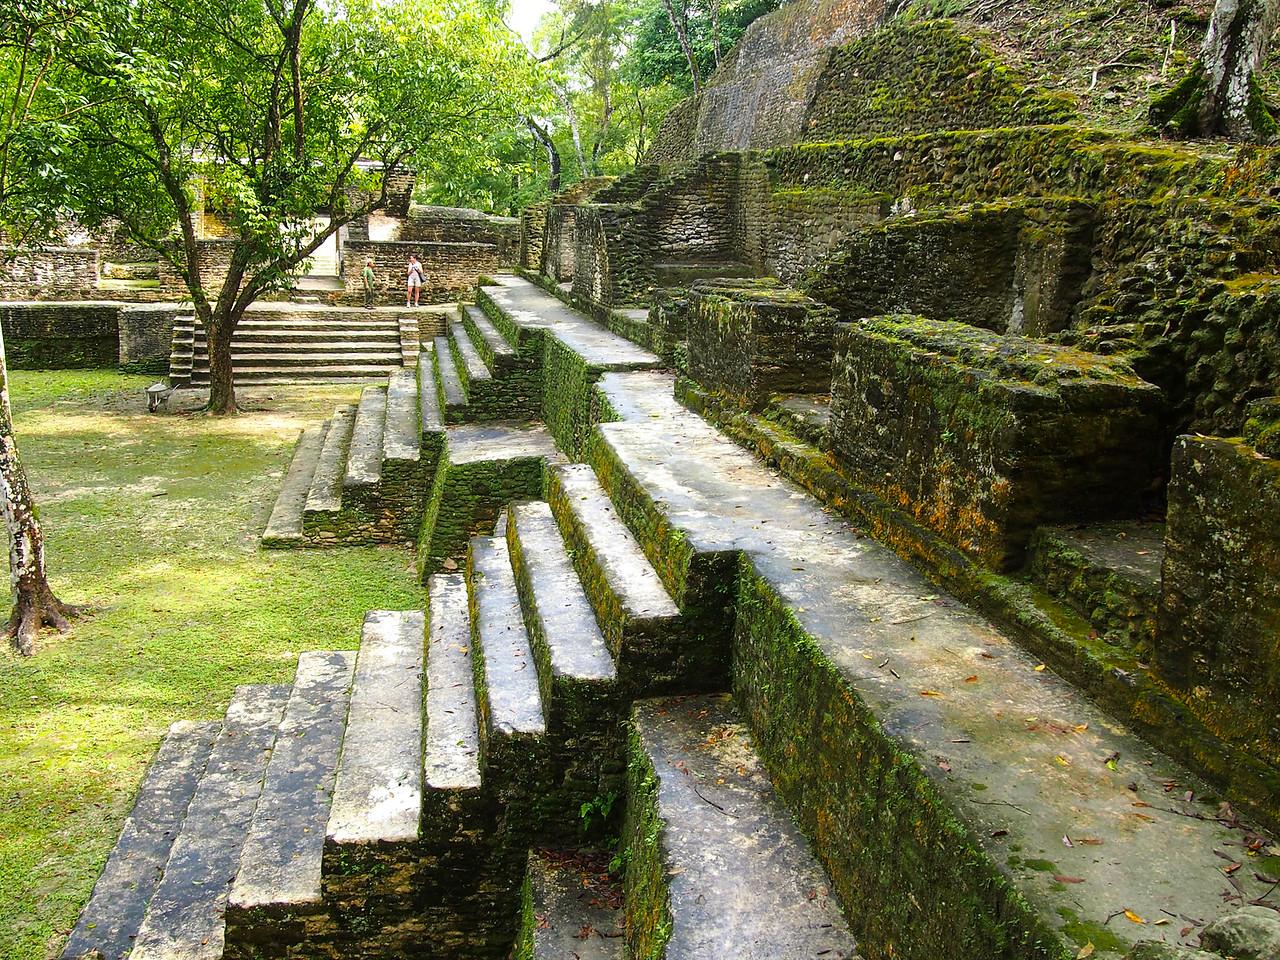 Cahal Pech ruins in Belize